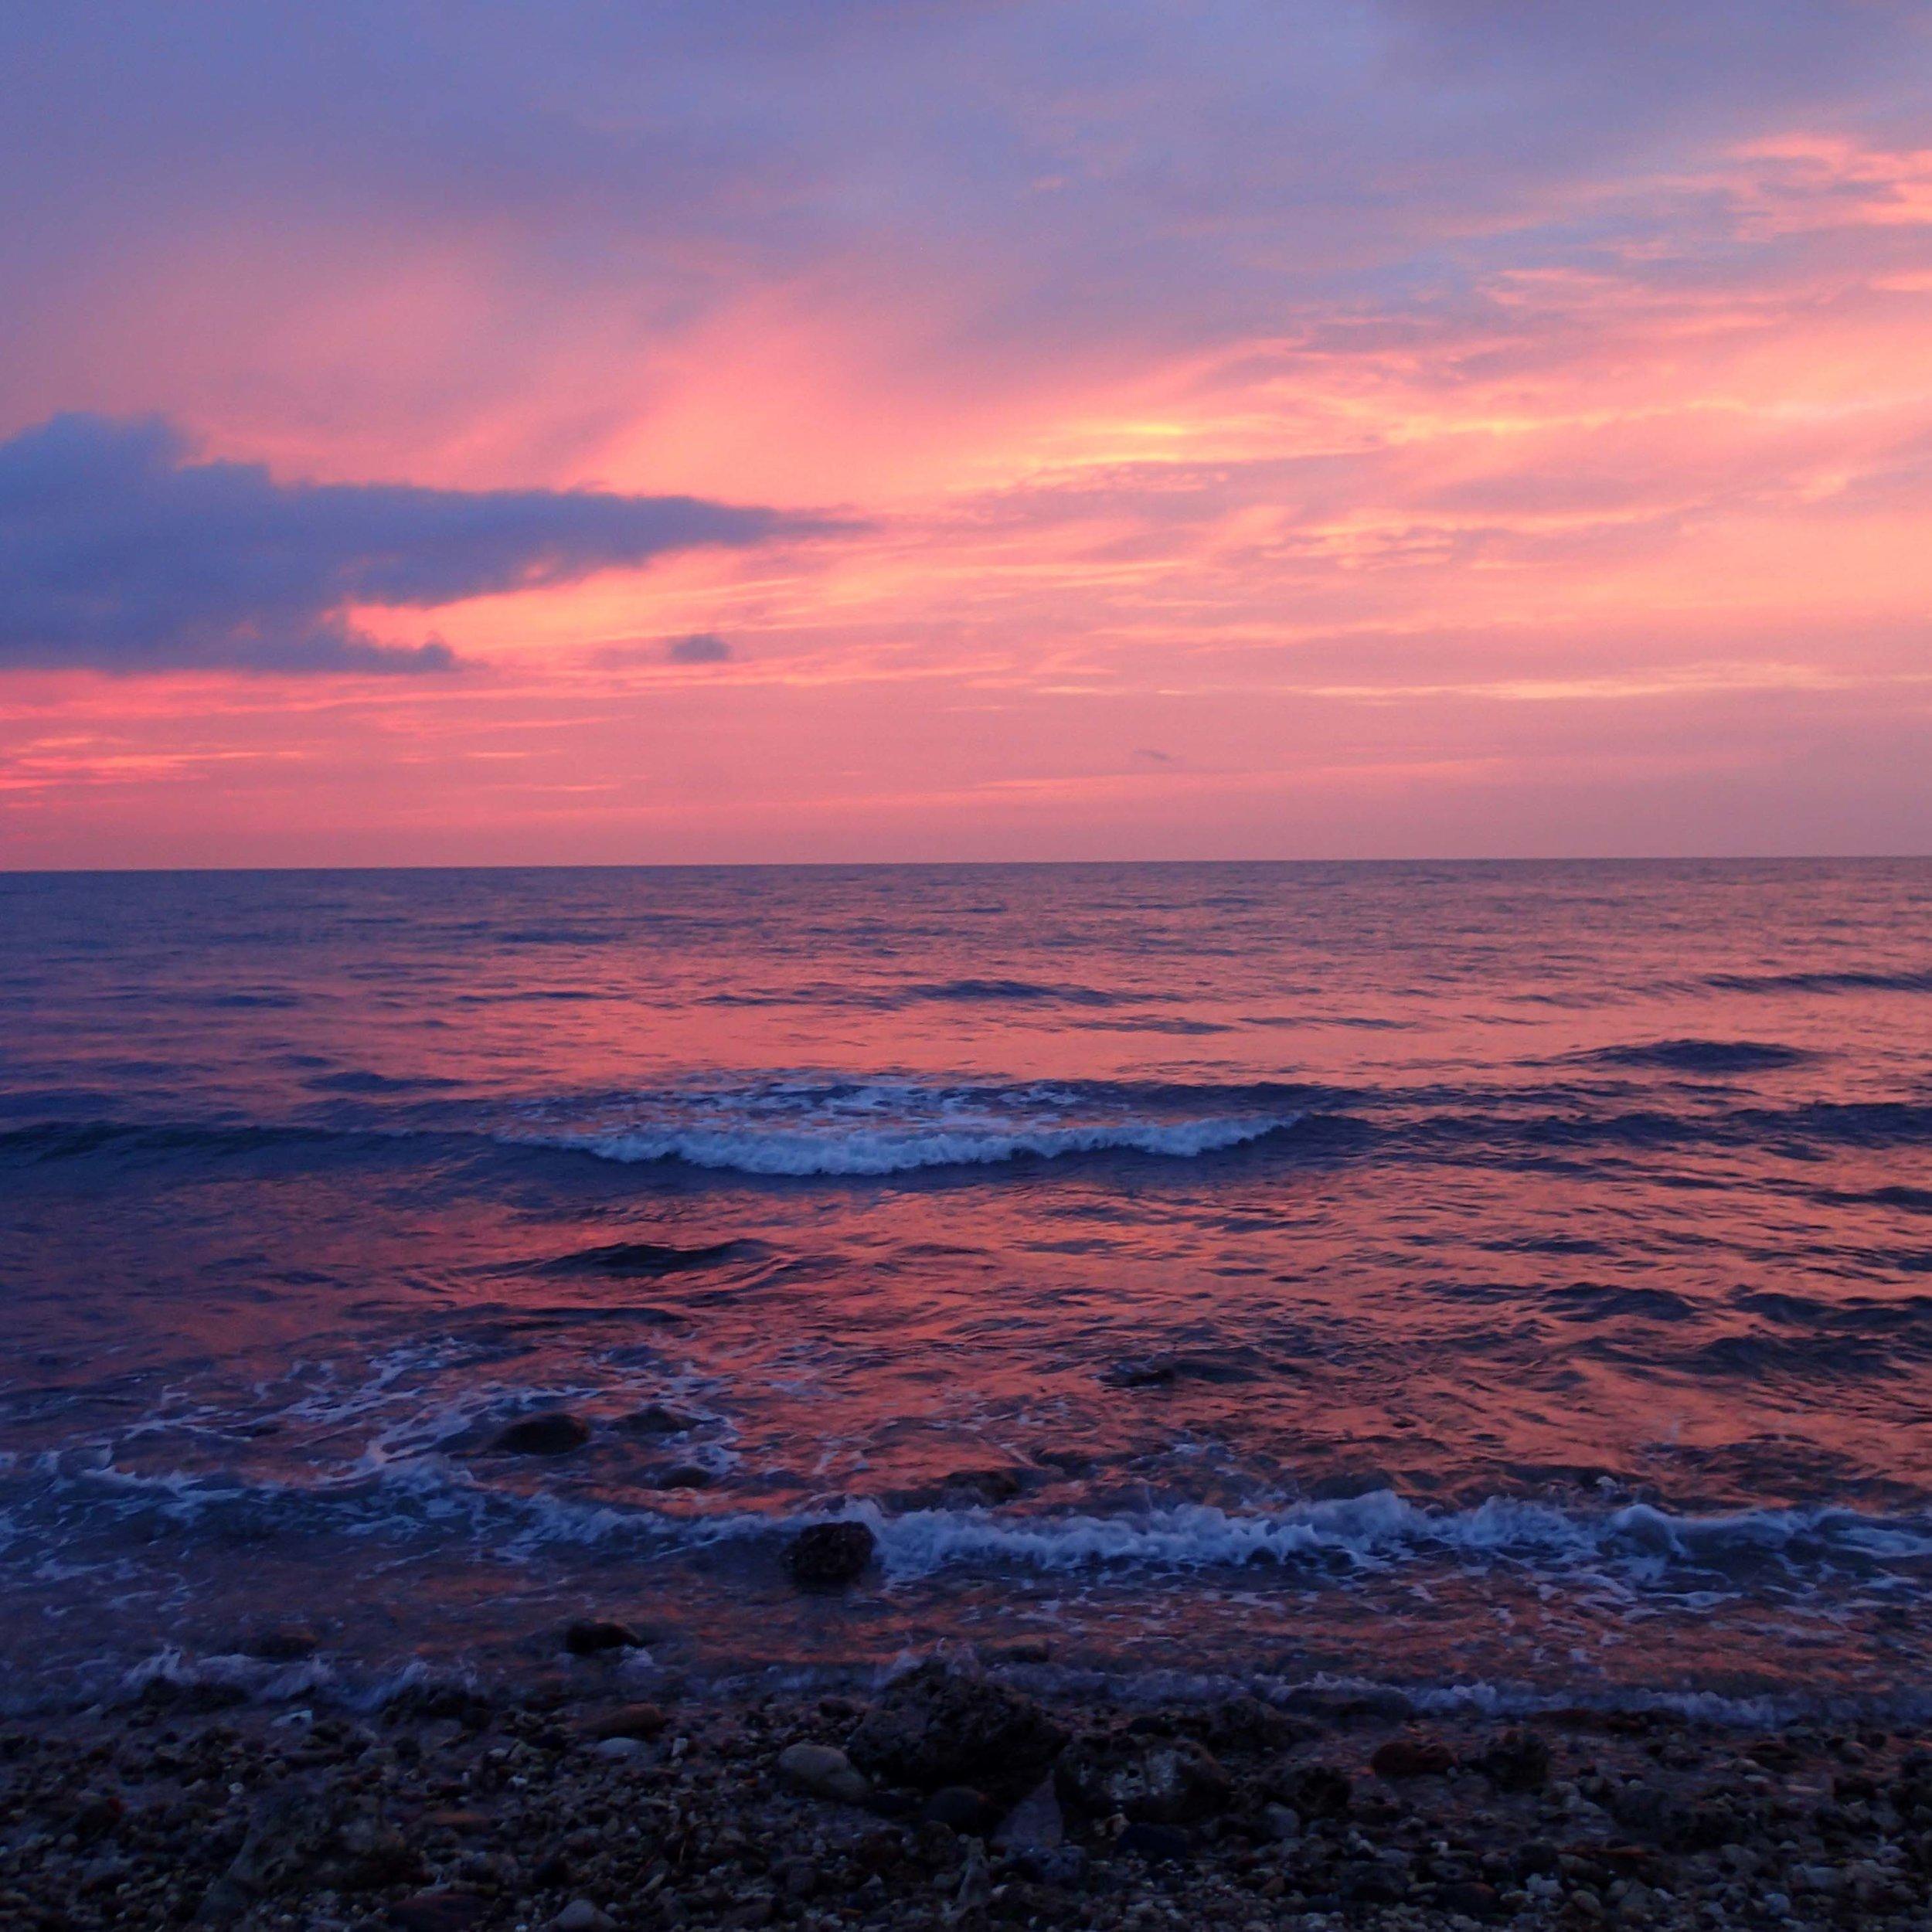 sunset from Houwan beach.jpg